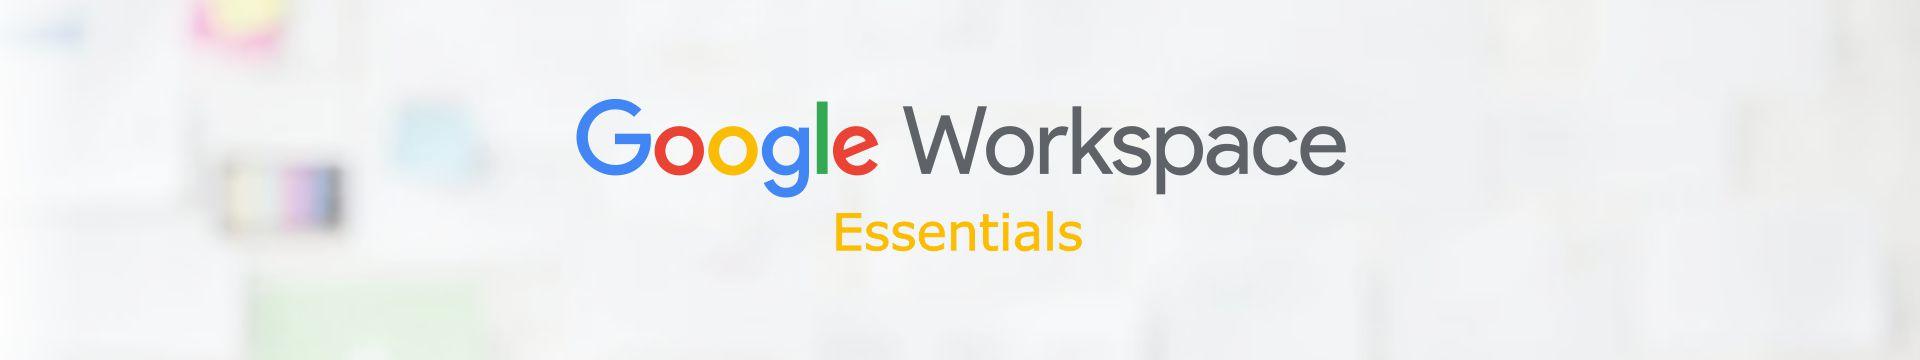 Google Workspace Essentials Peru